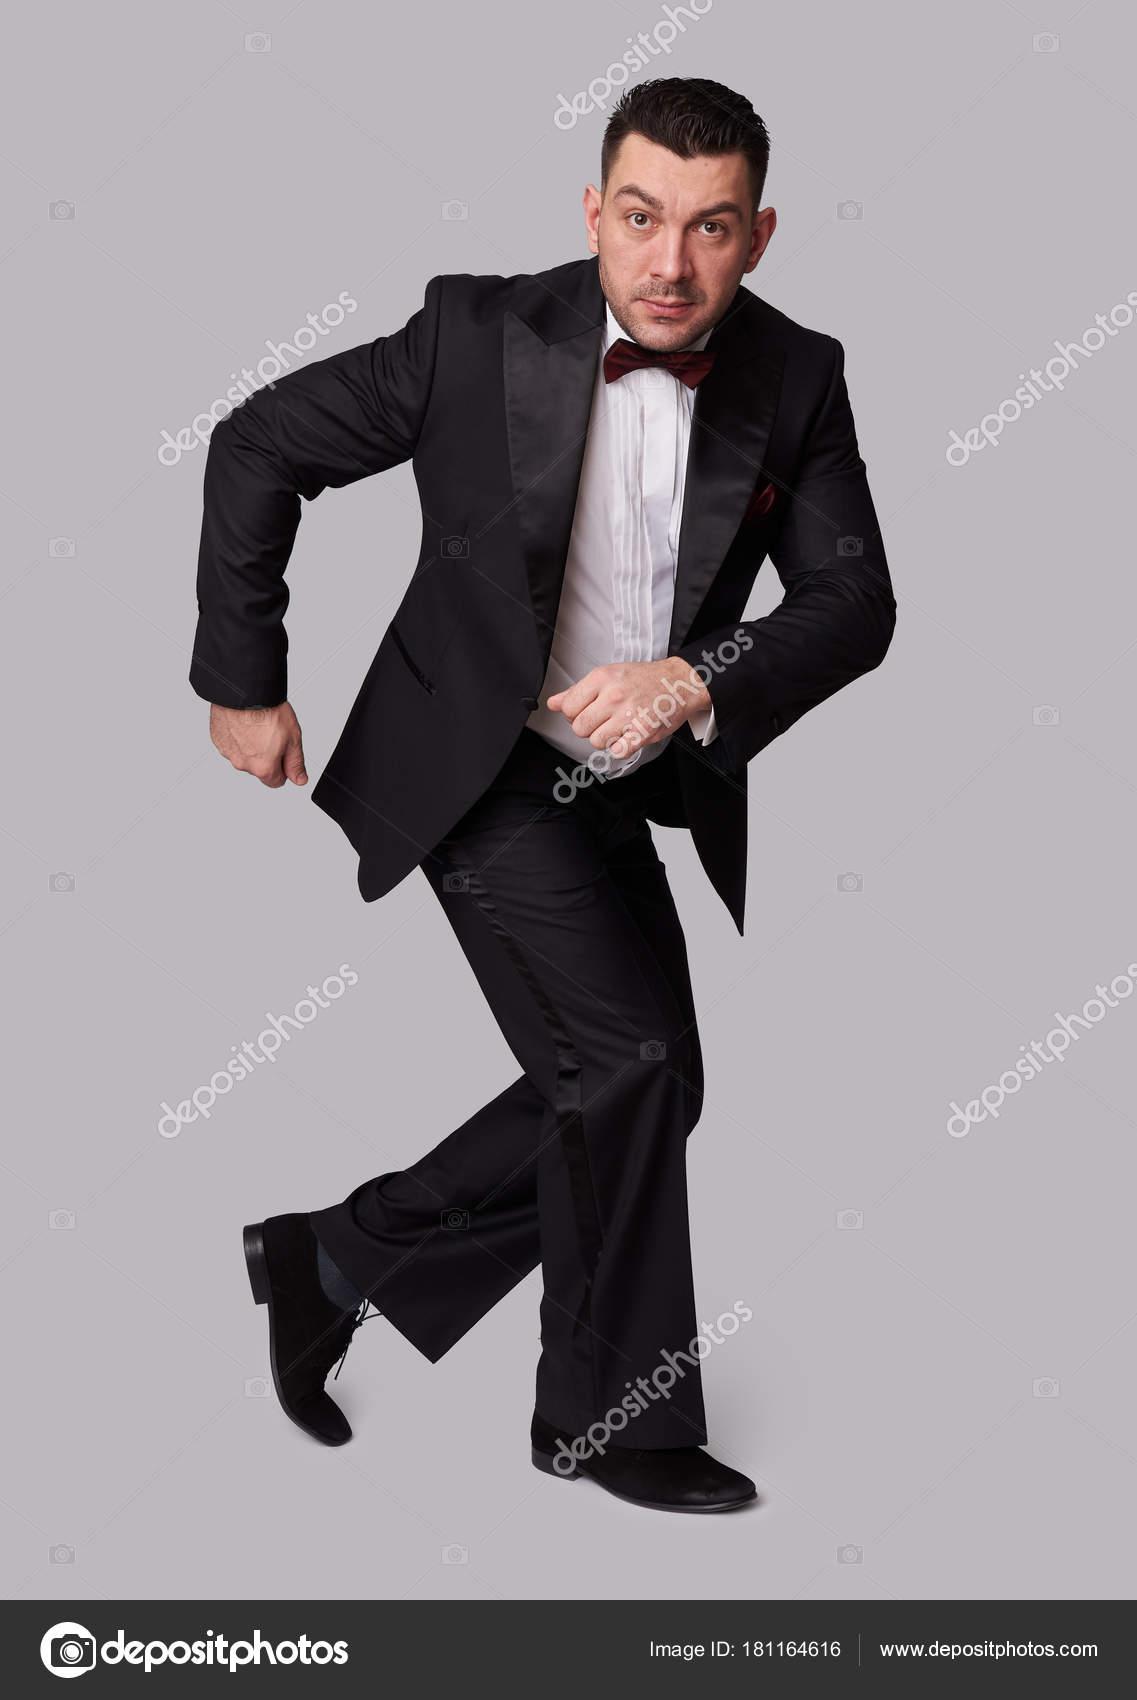 gracioso hombre elegante esmoquin negro — Foto de stock © spaxiax ... b8abe1d39f9